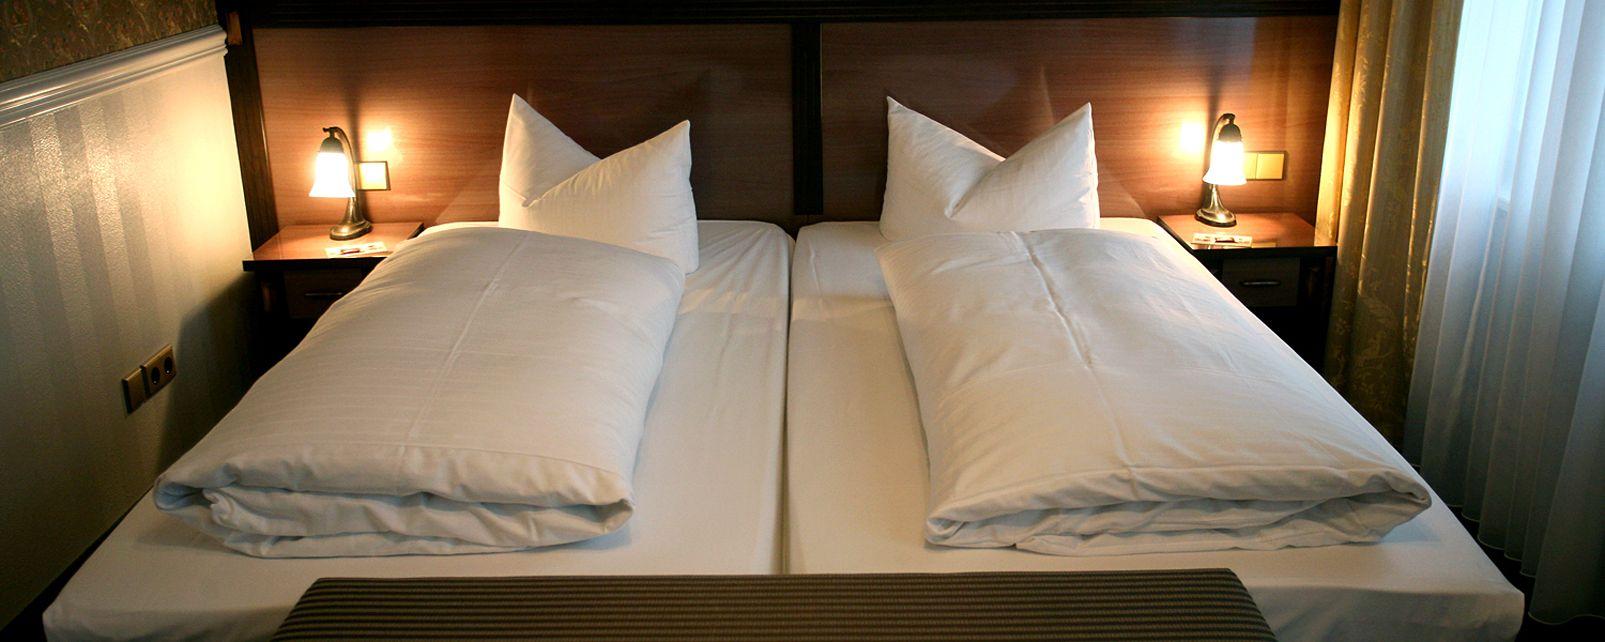 Hotel Myer's